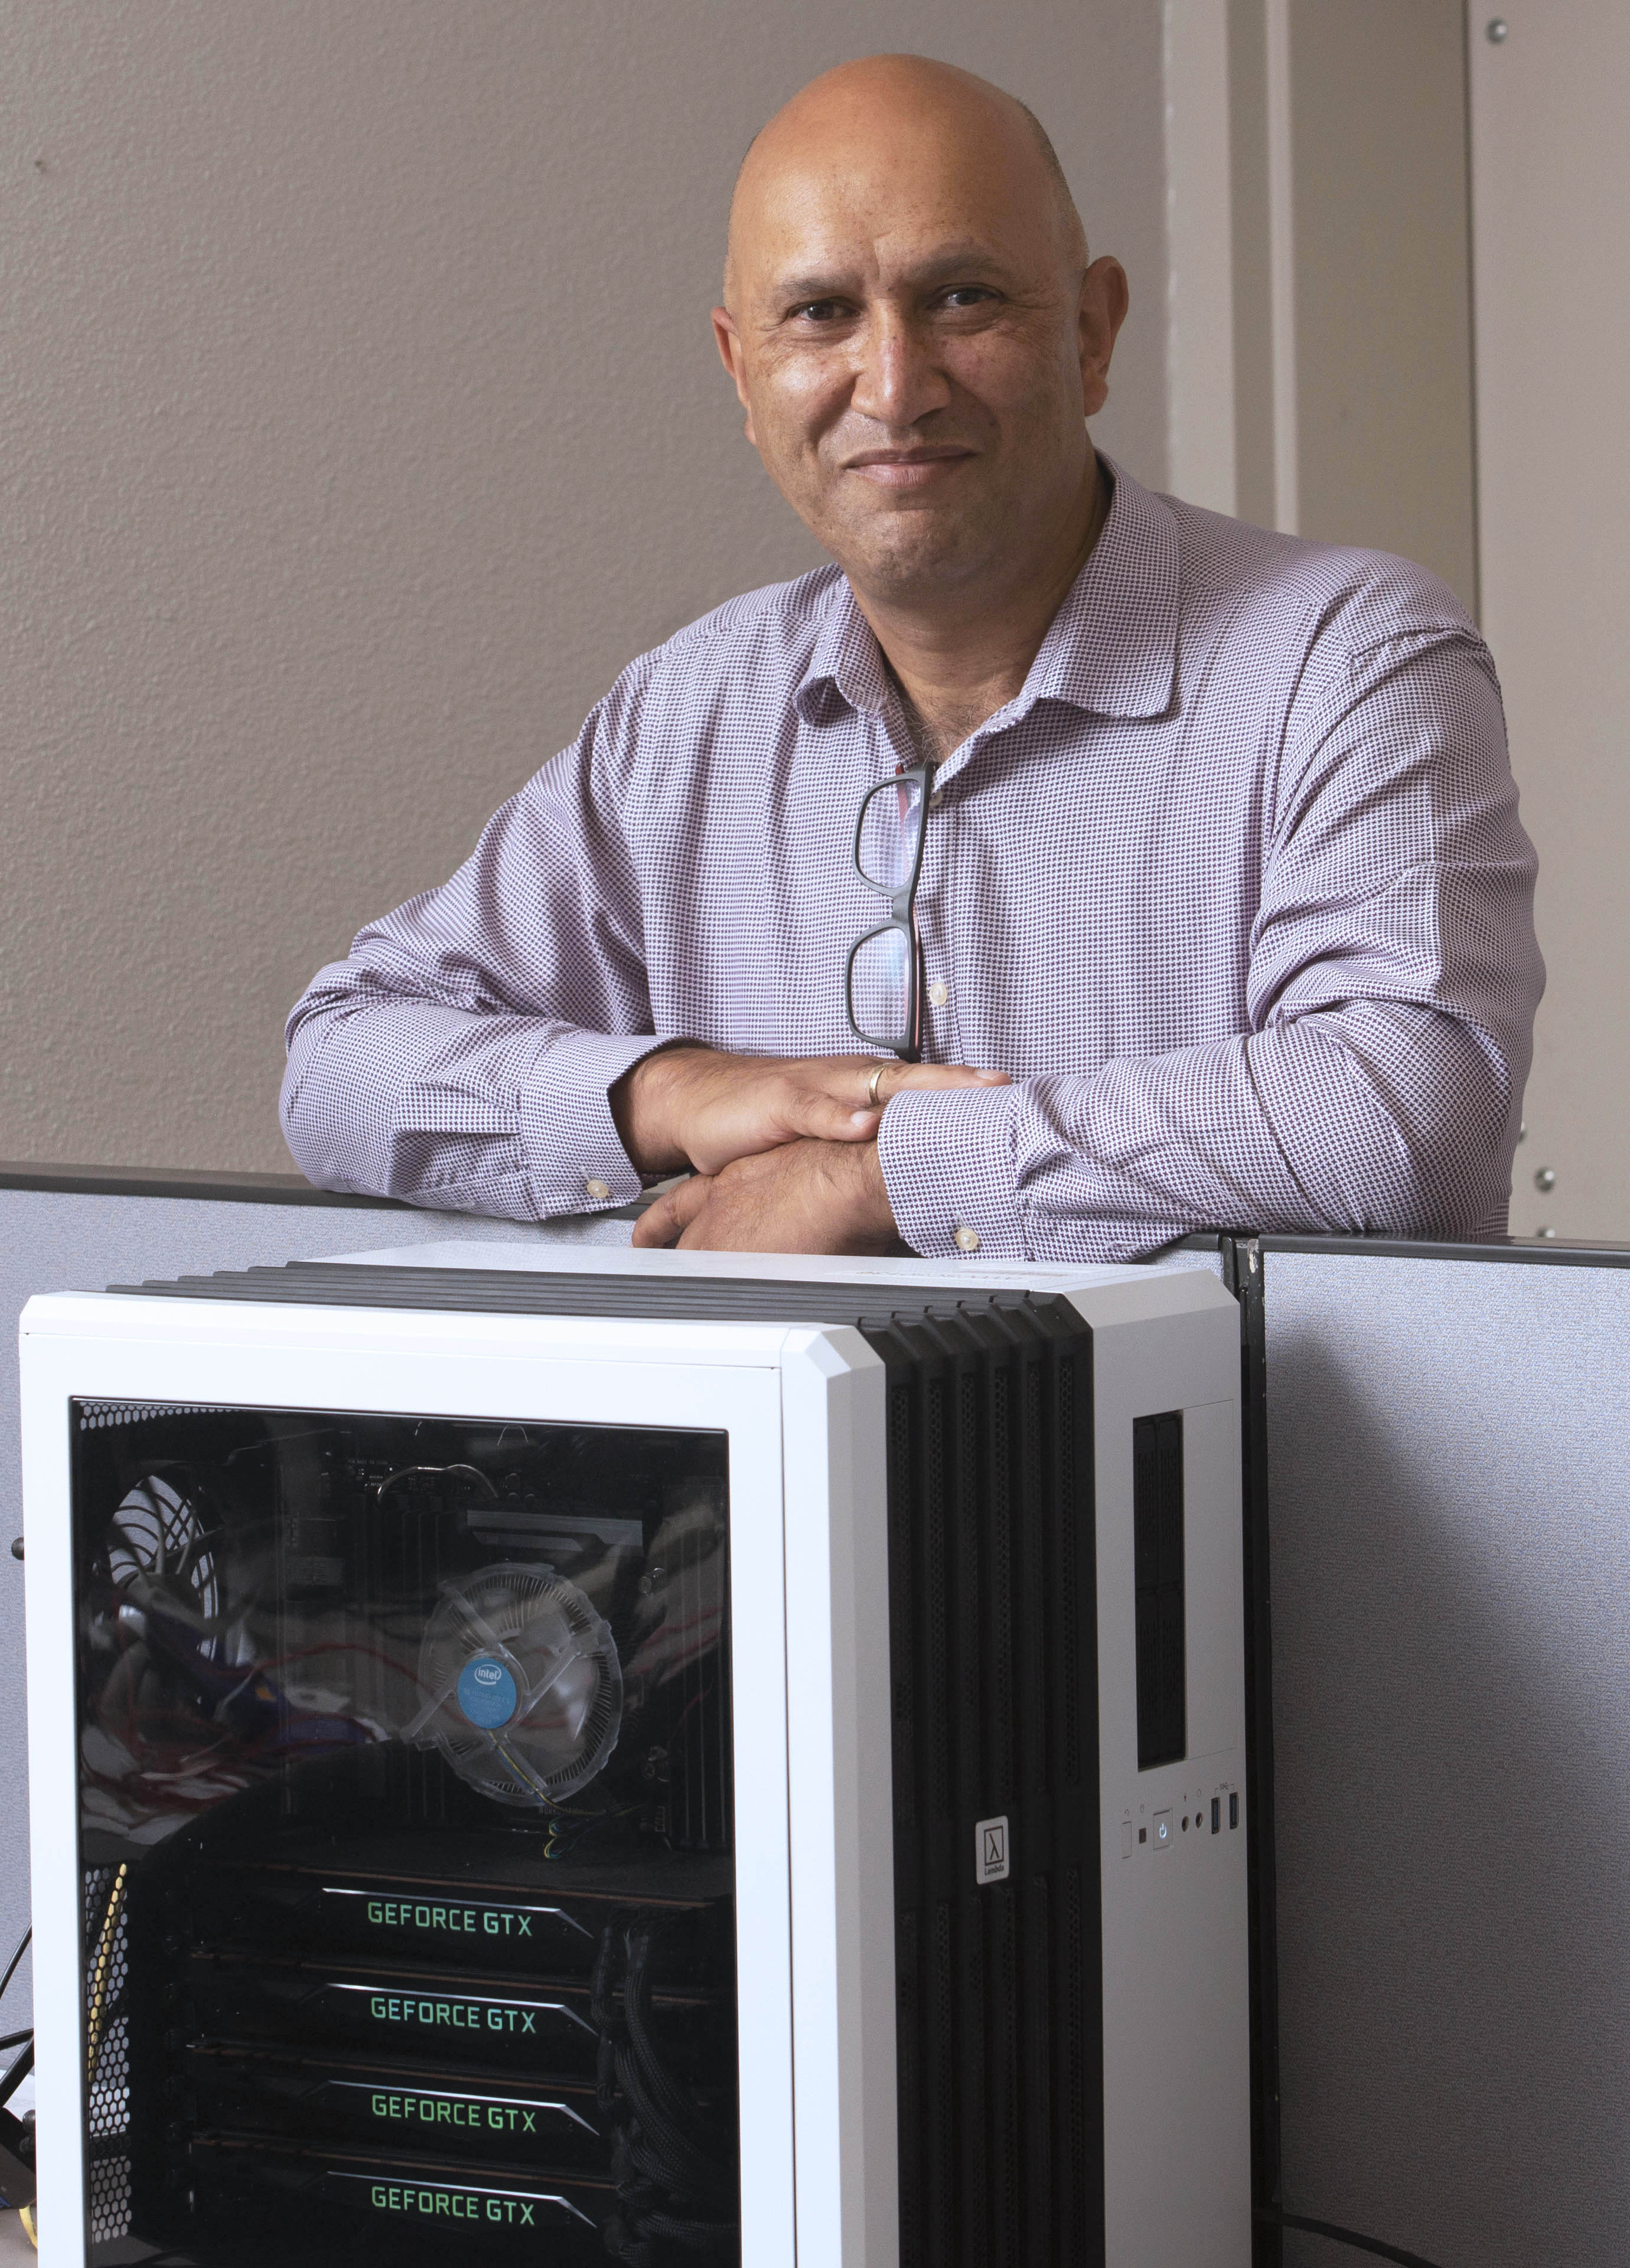 Ian Davidson poses with a computer